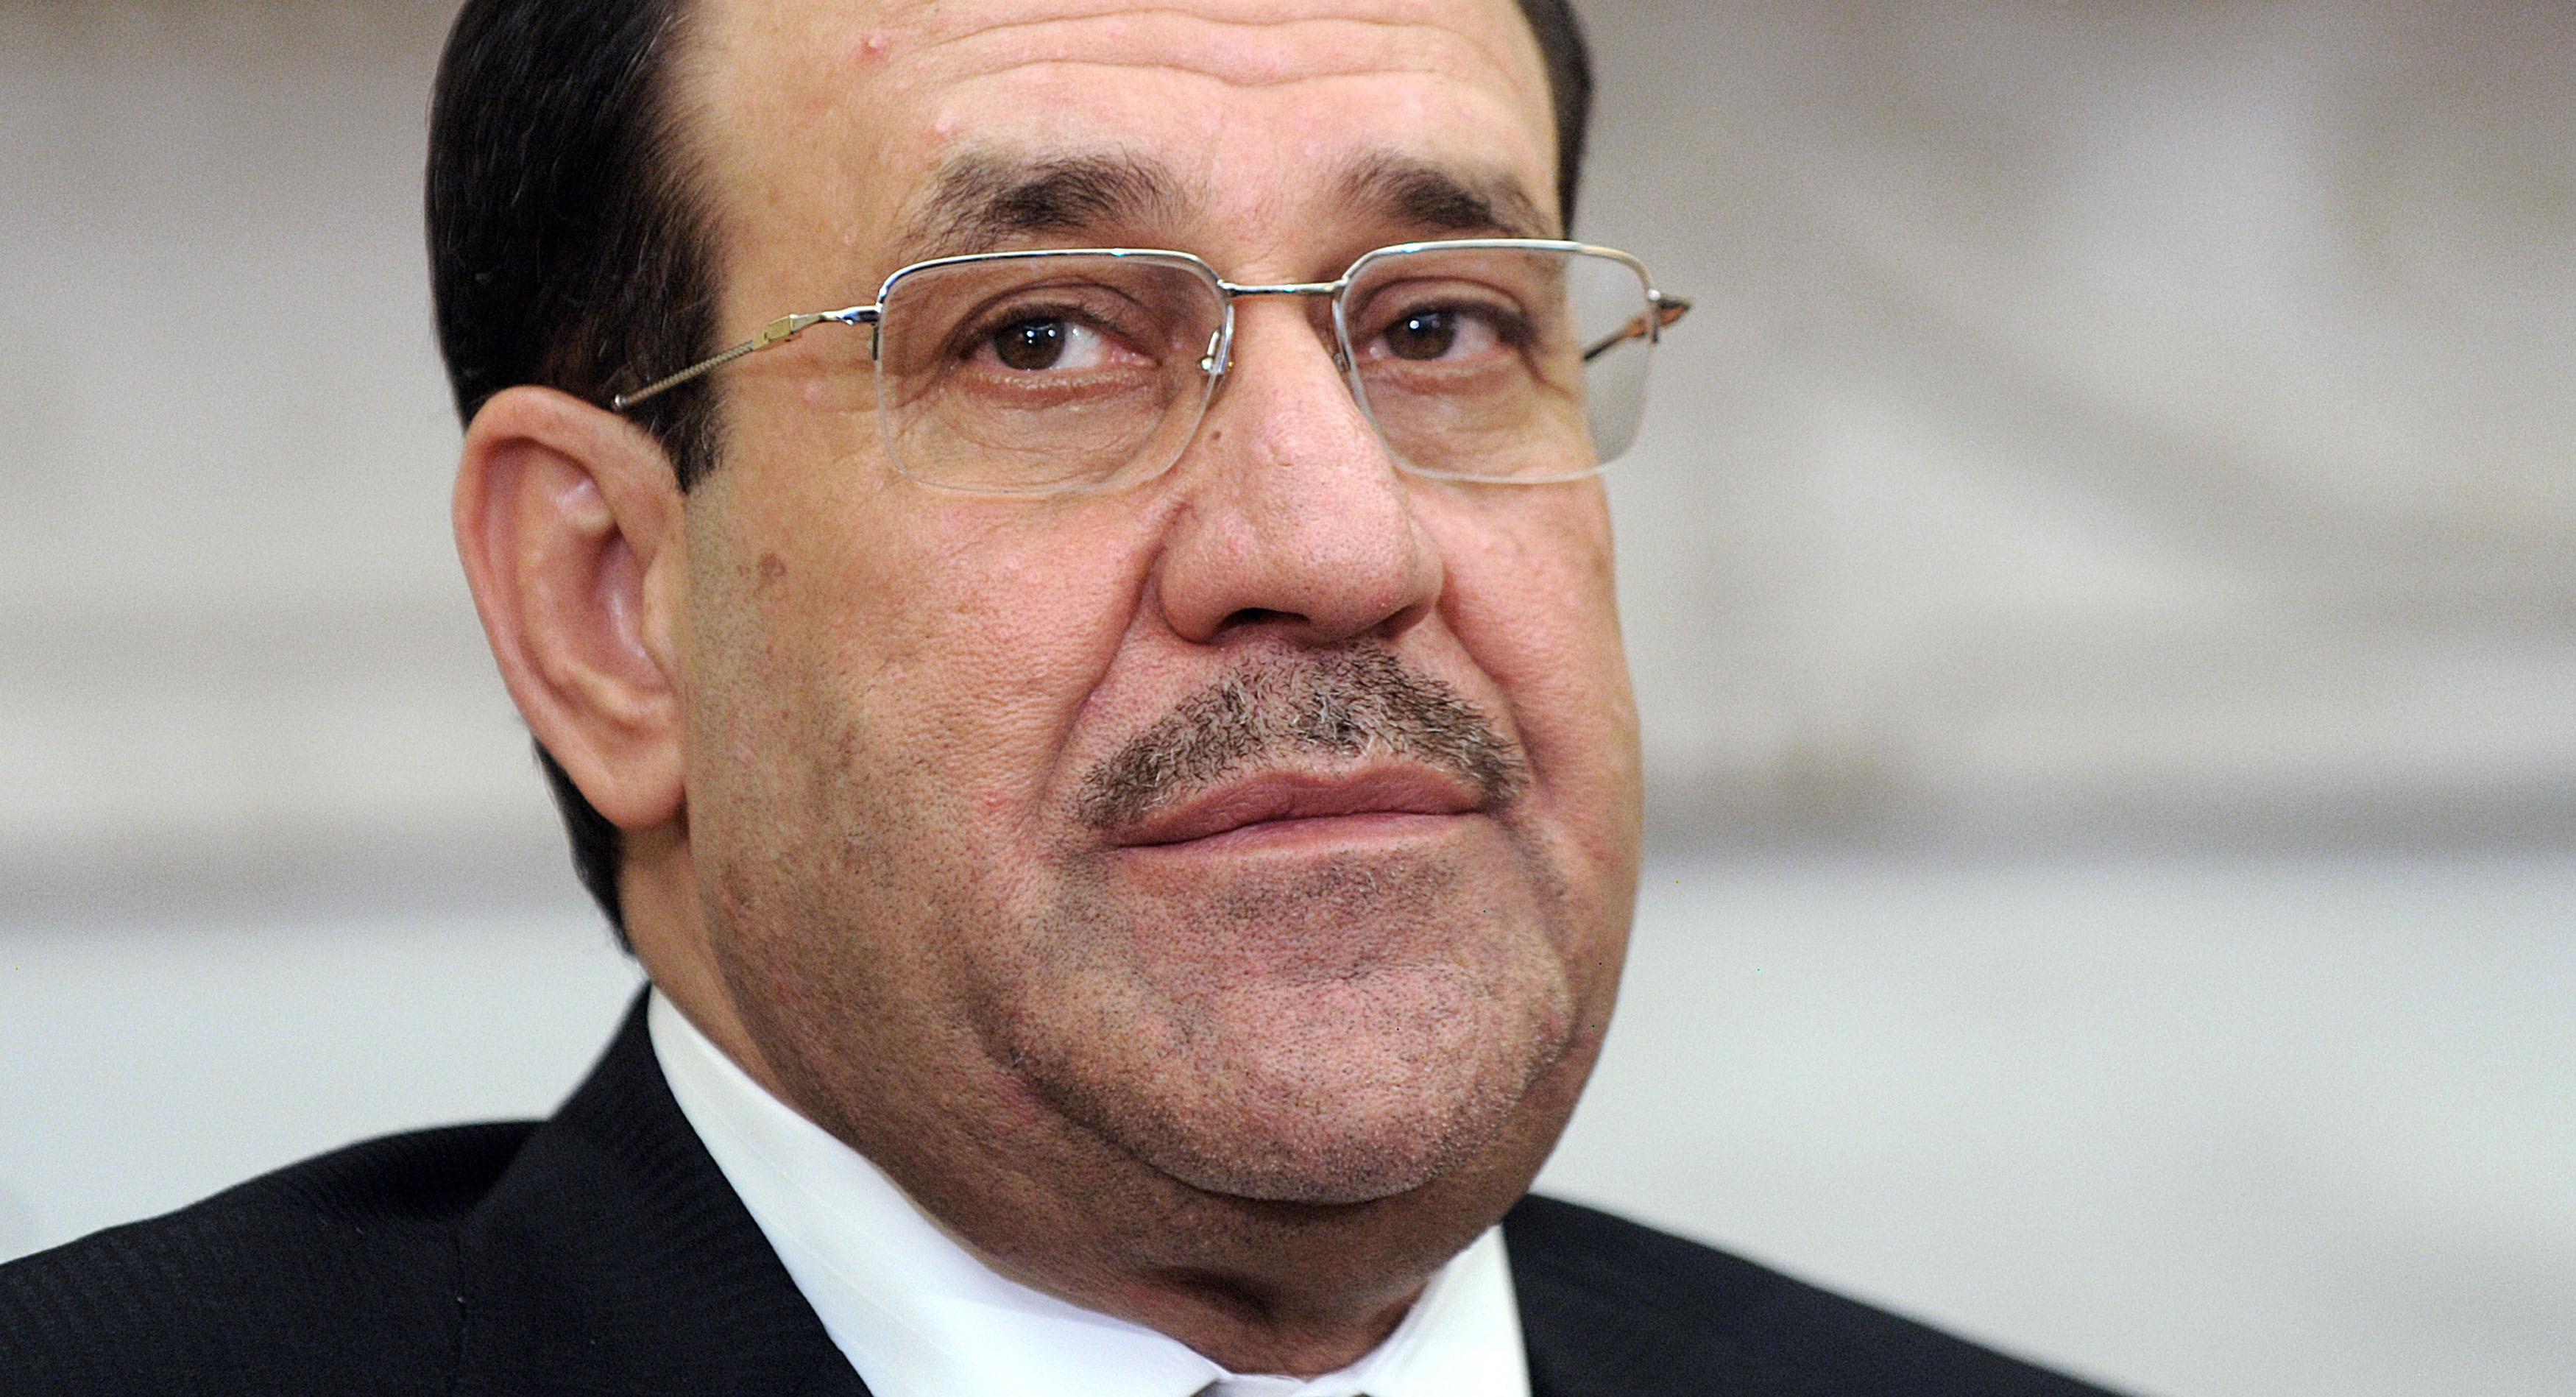 Iraqi Prime Minister Nouri al-Maliki speaks during a meeting with U.S. President Barack Obama at the White House, in Washington, on Nov. 1, 2013